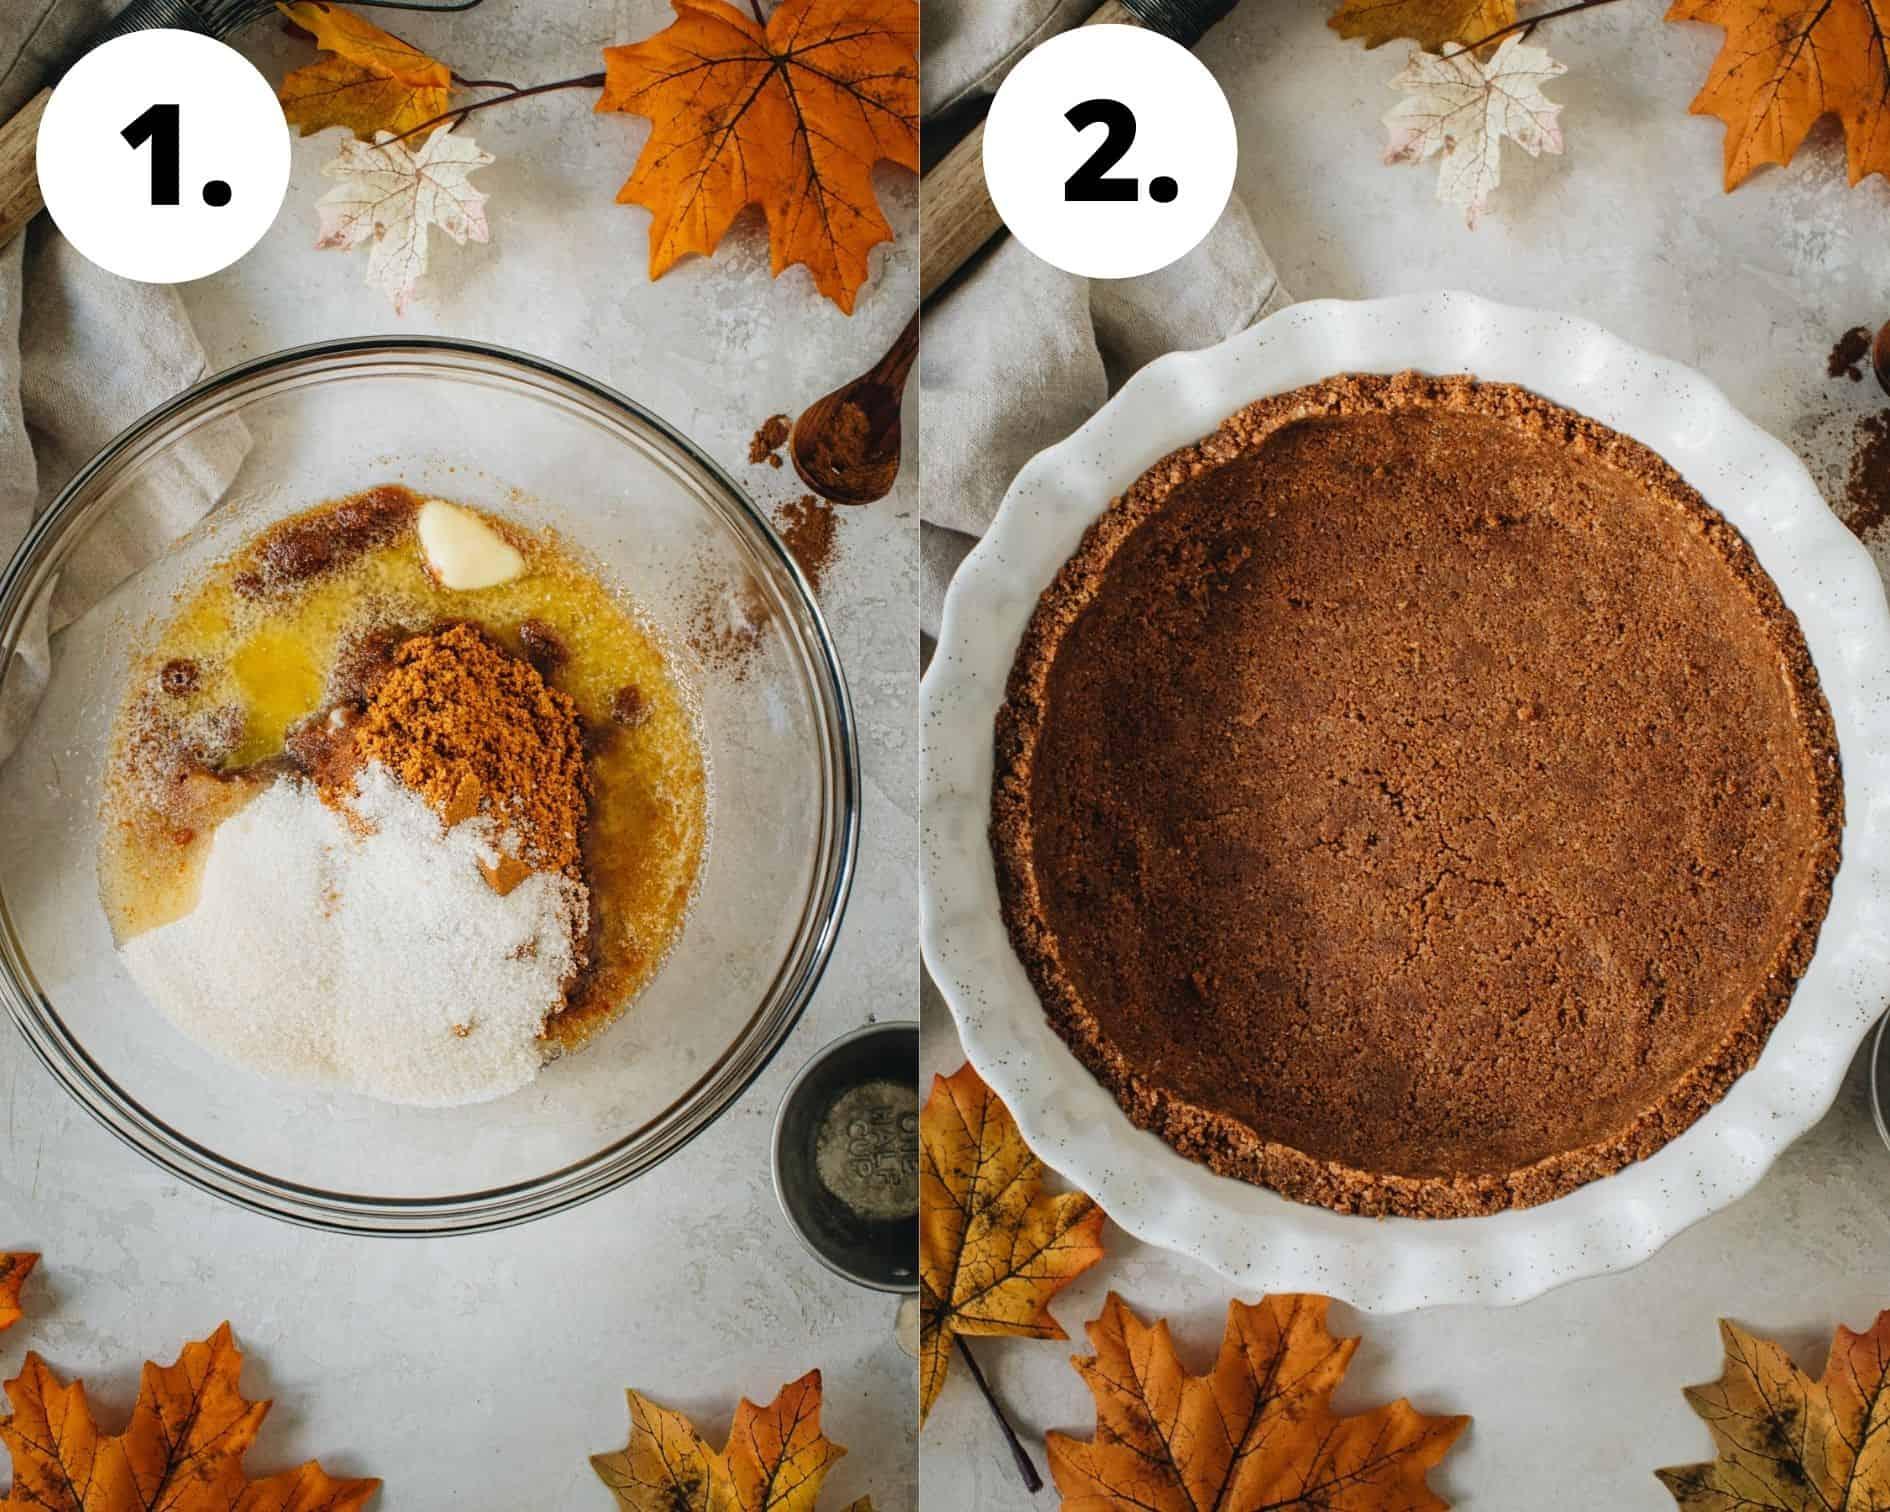 No-bake pumpkin pie process steps 1 and 2.